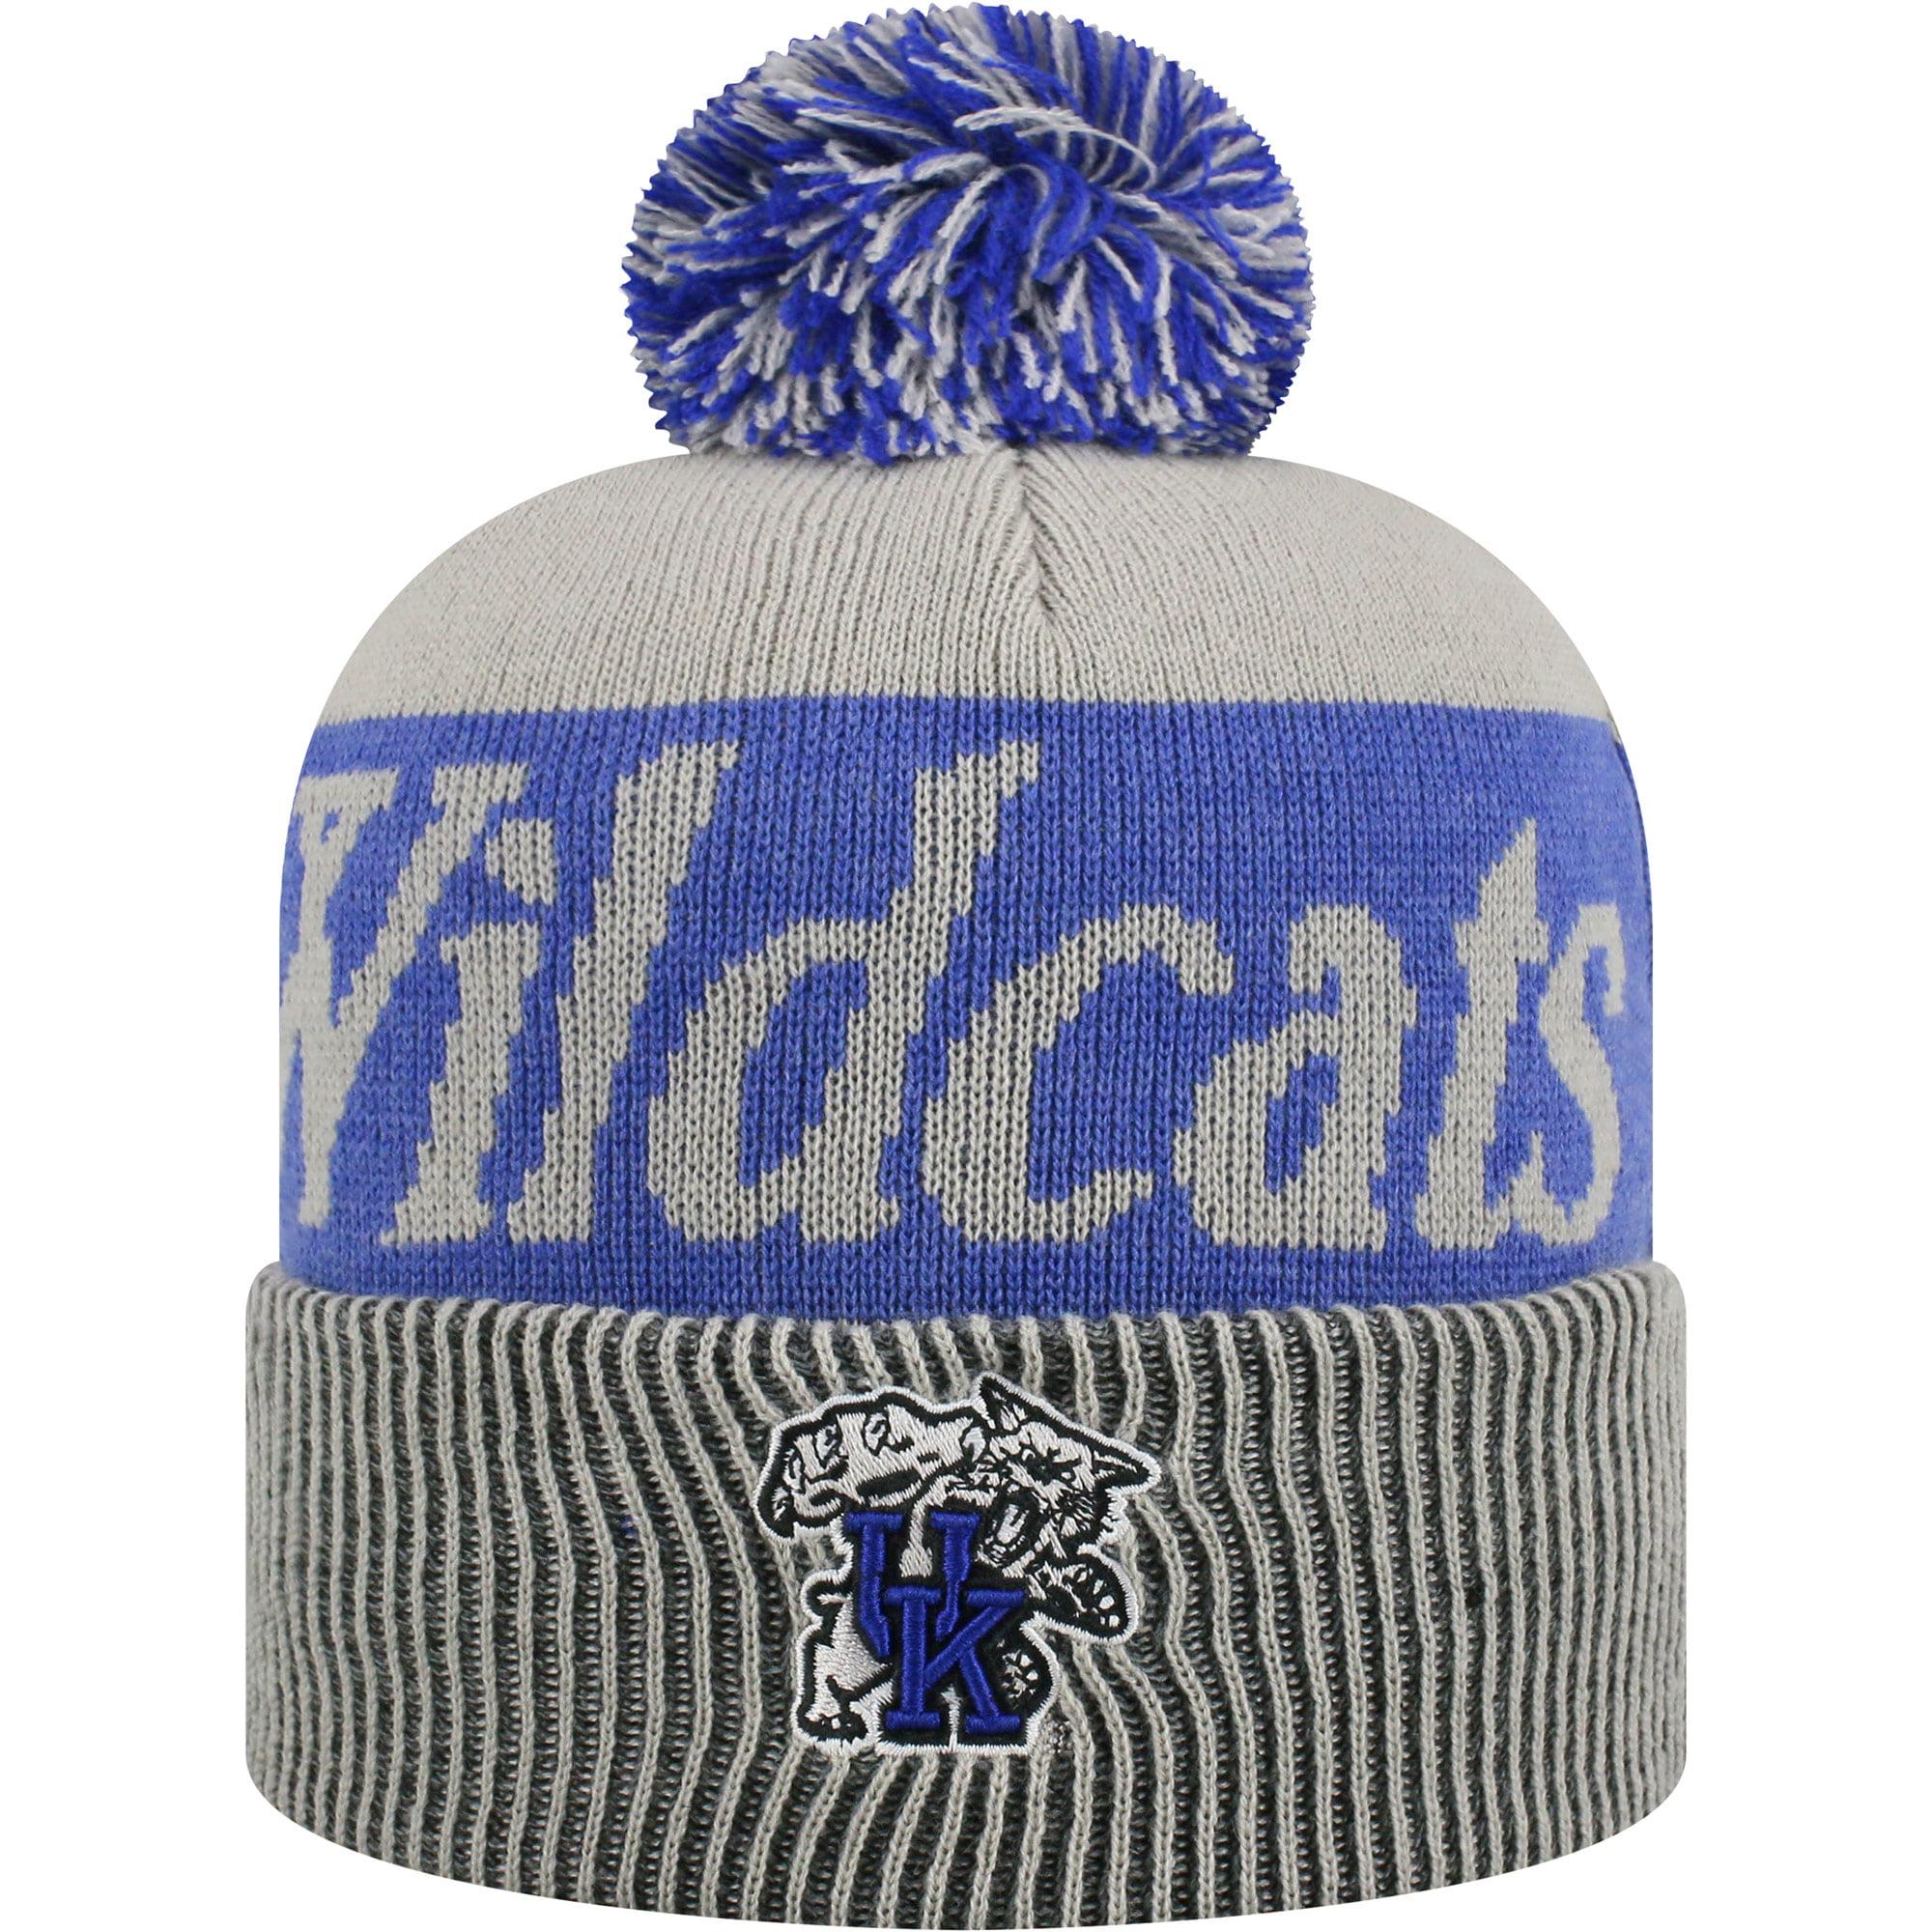 76b75b8b5 clearance kentucky wildcats knit hat 9b03f 5322c